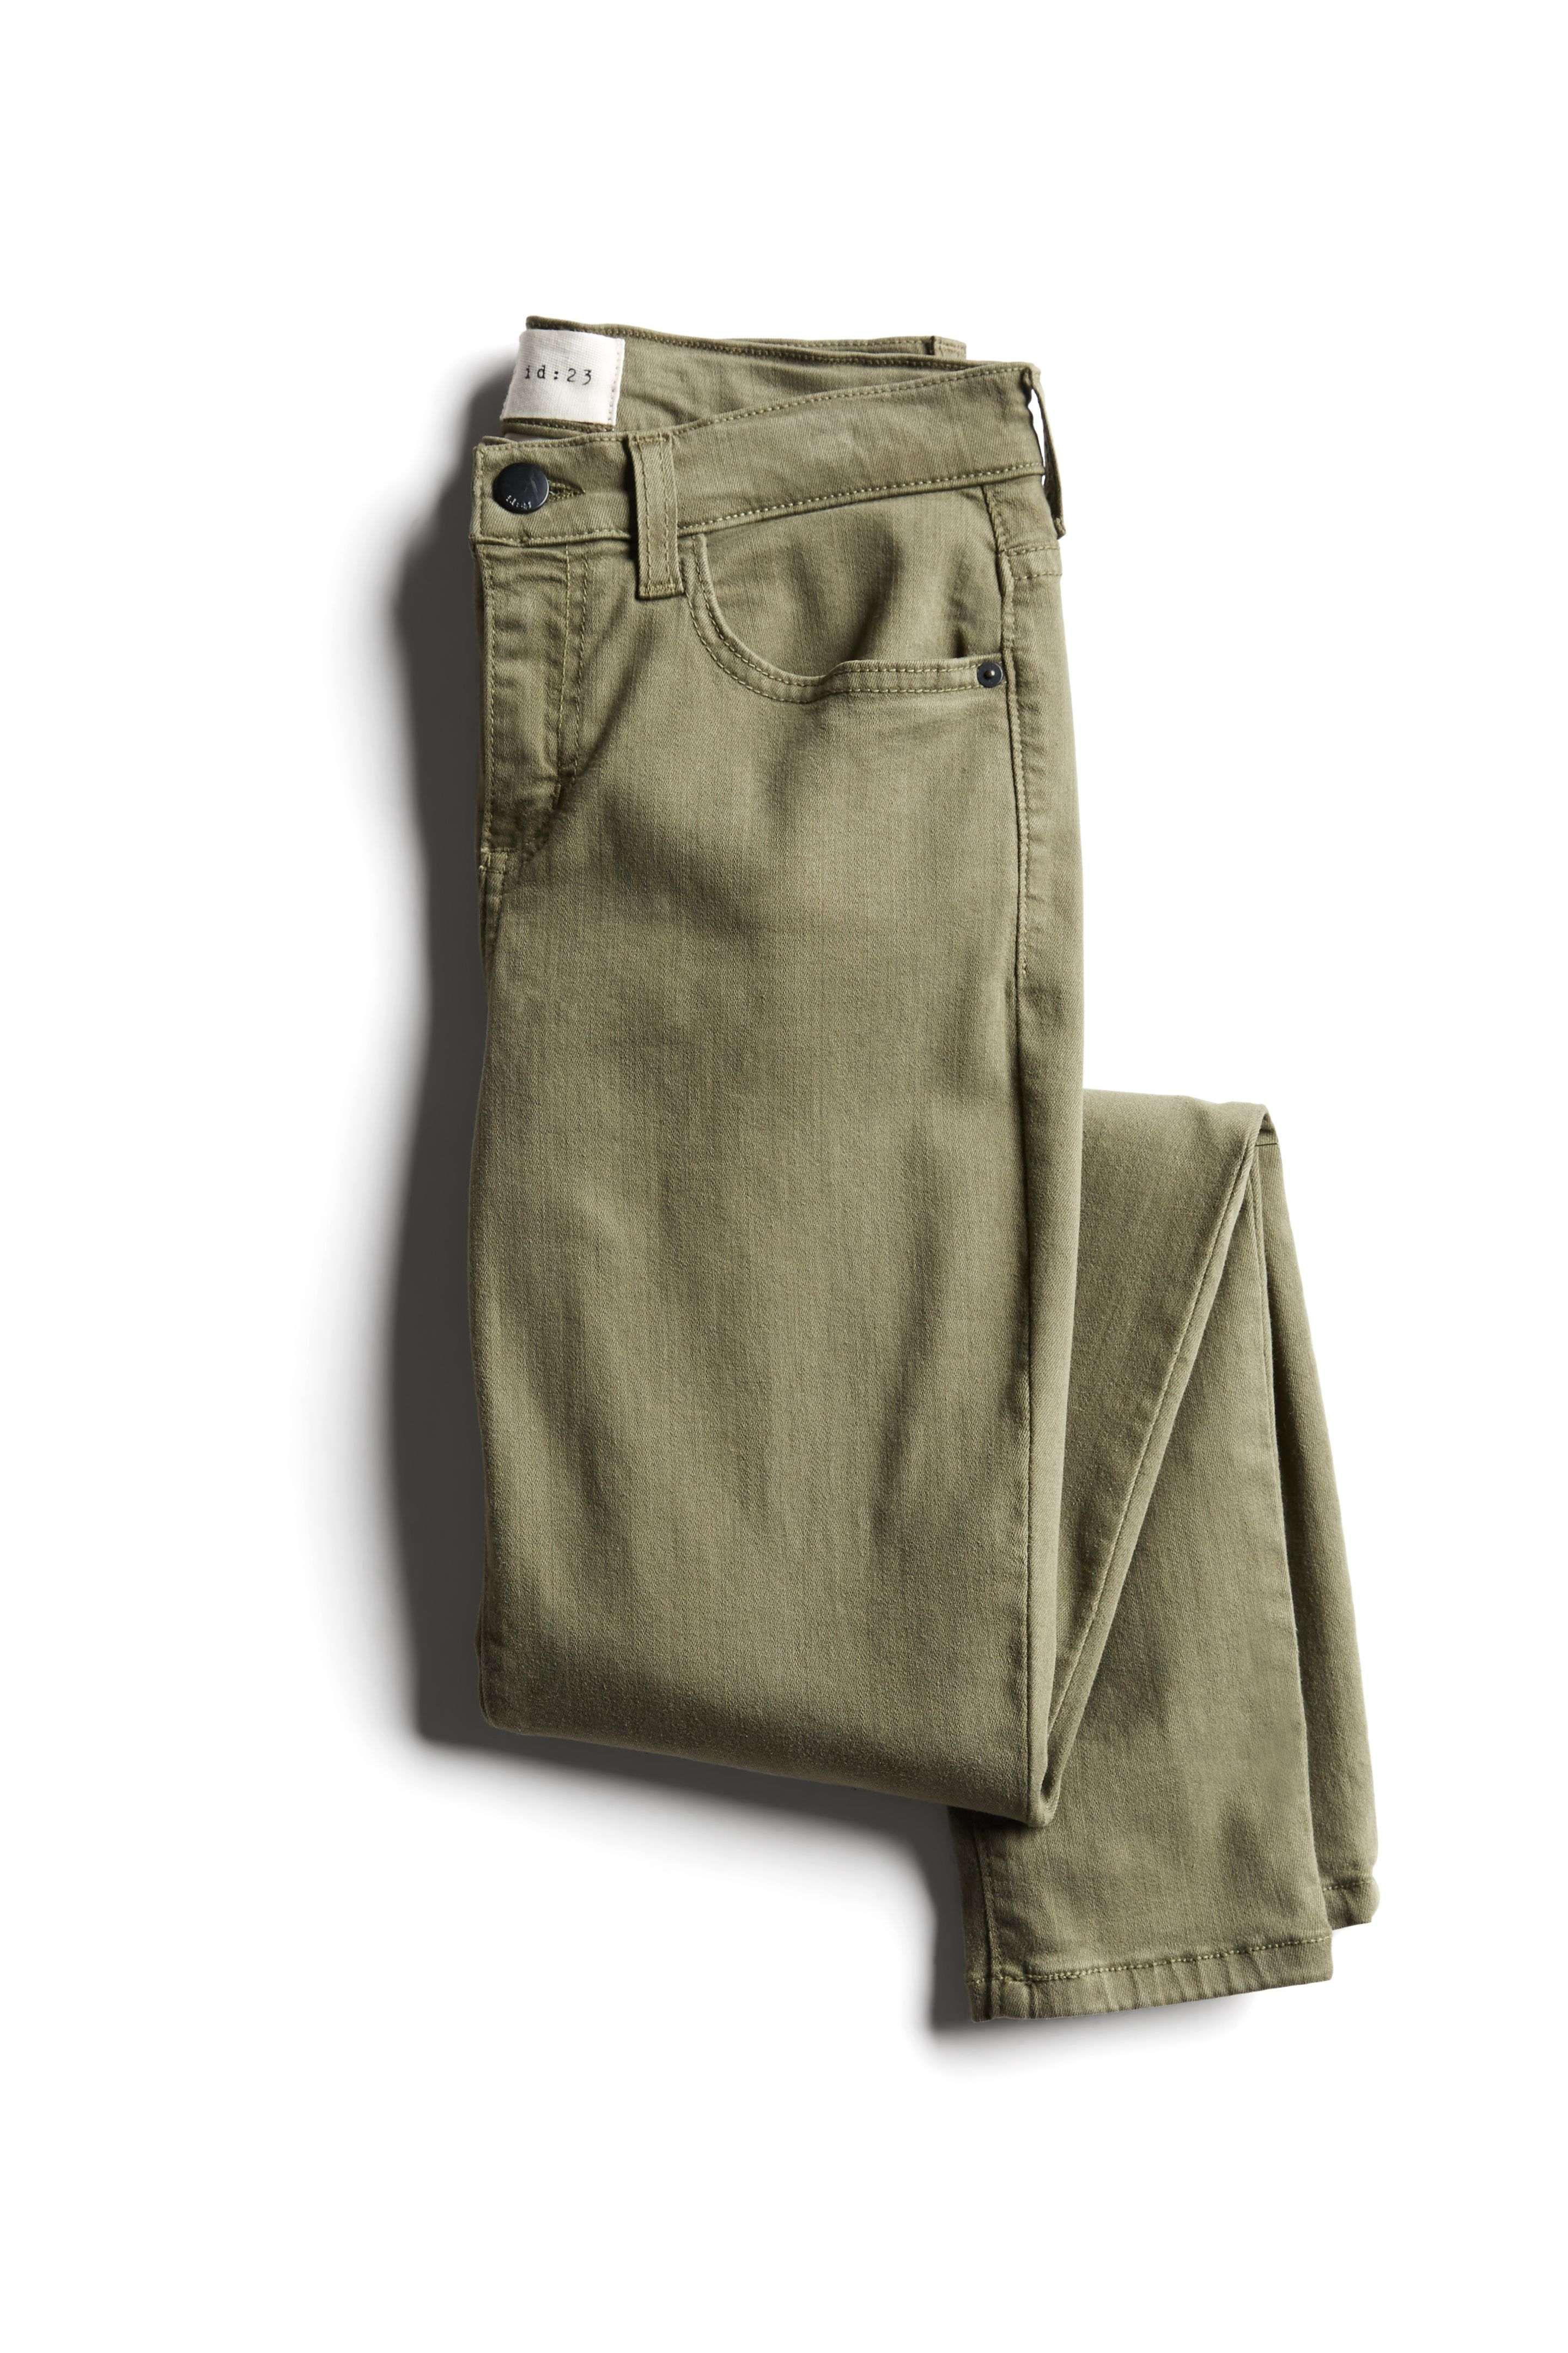 e85de2e5d9b What do I wear with colored denim | Outfit Ideas: Fall Style ...